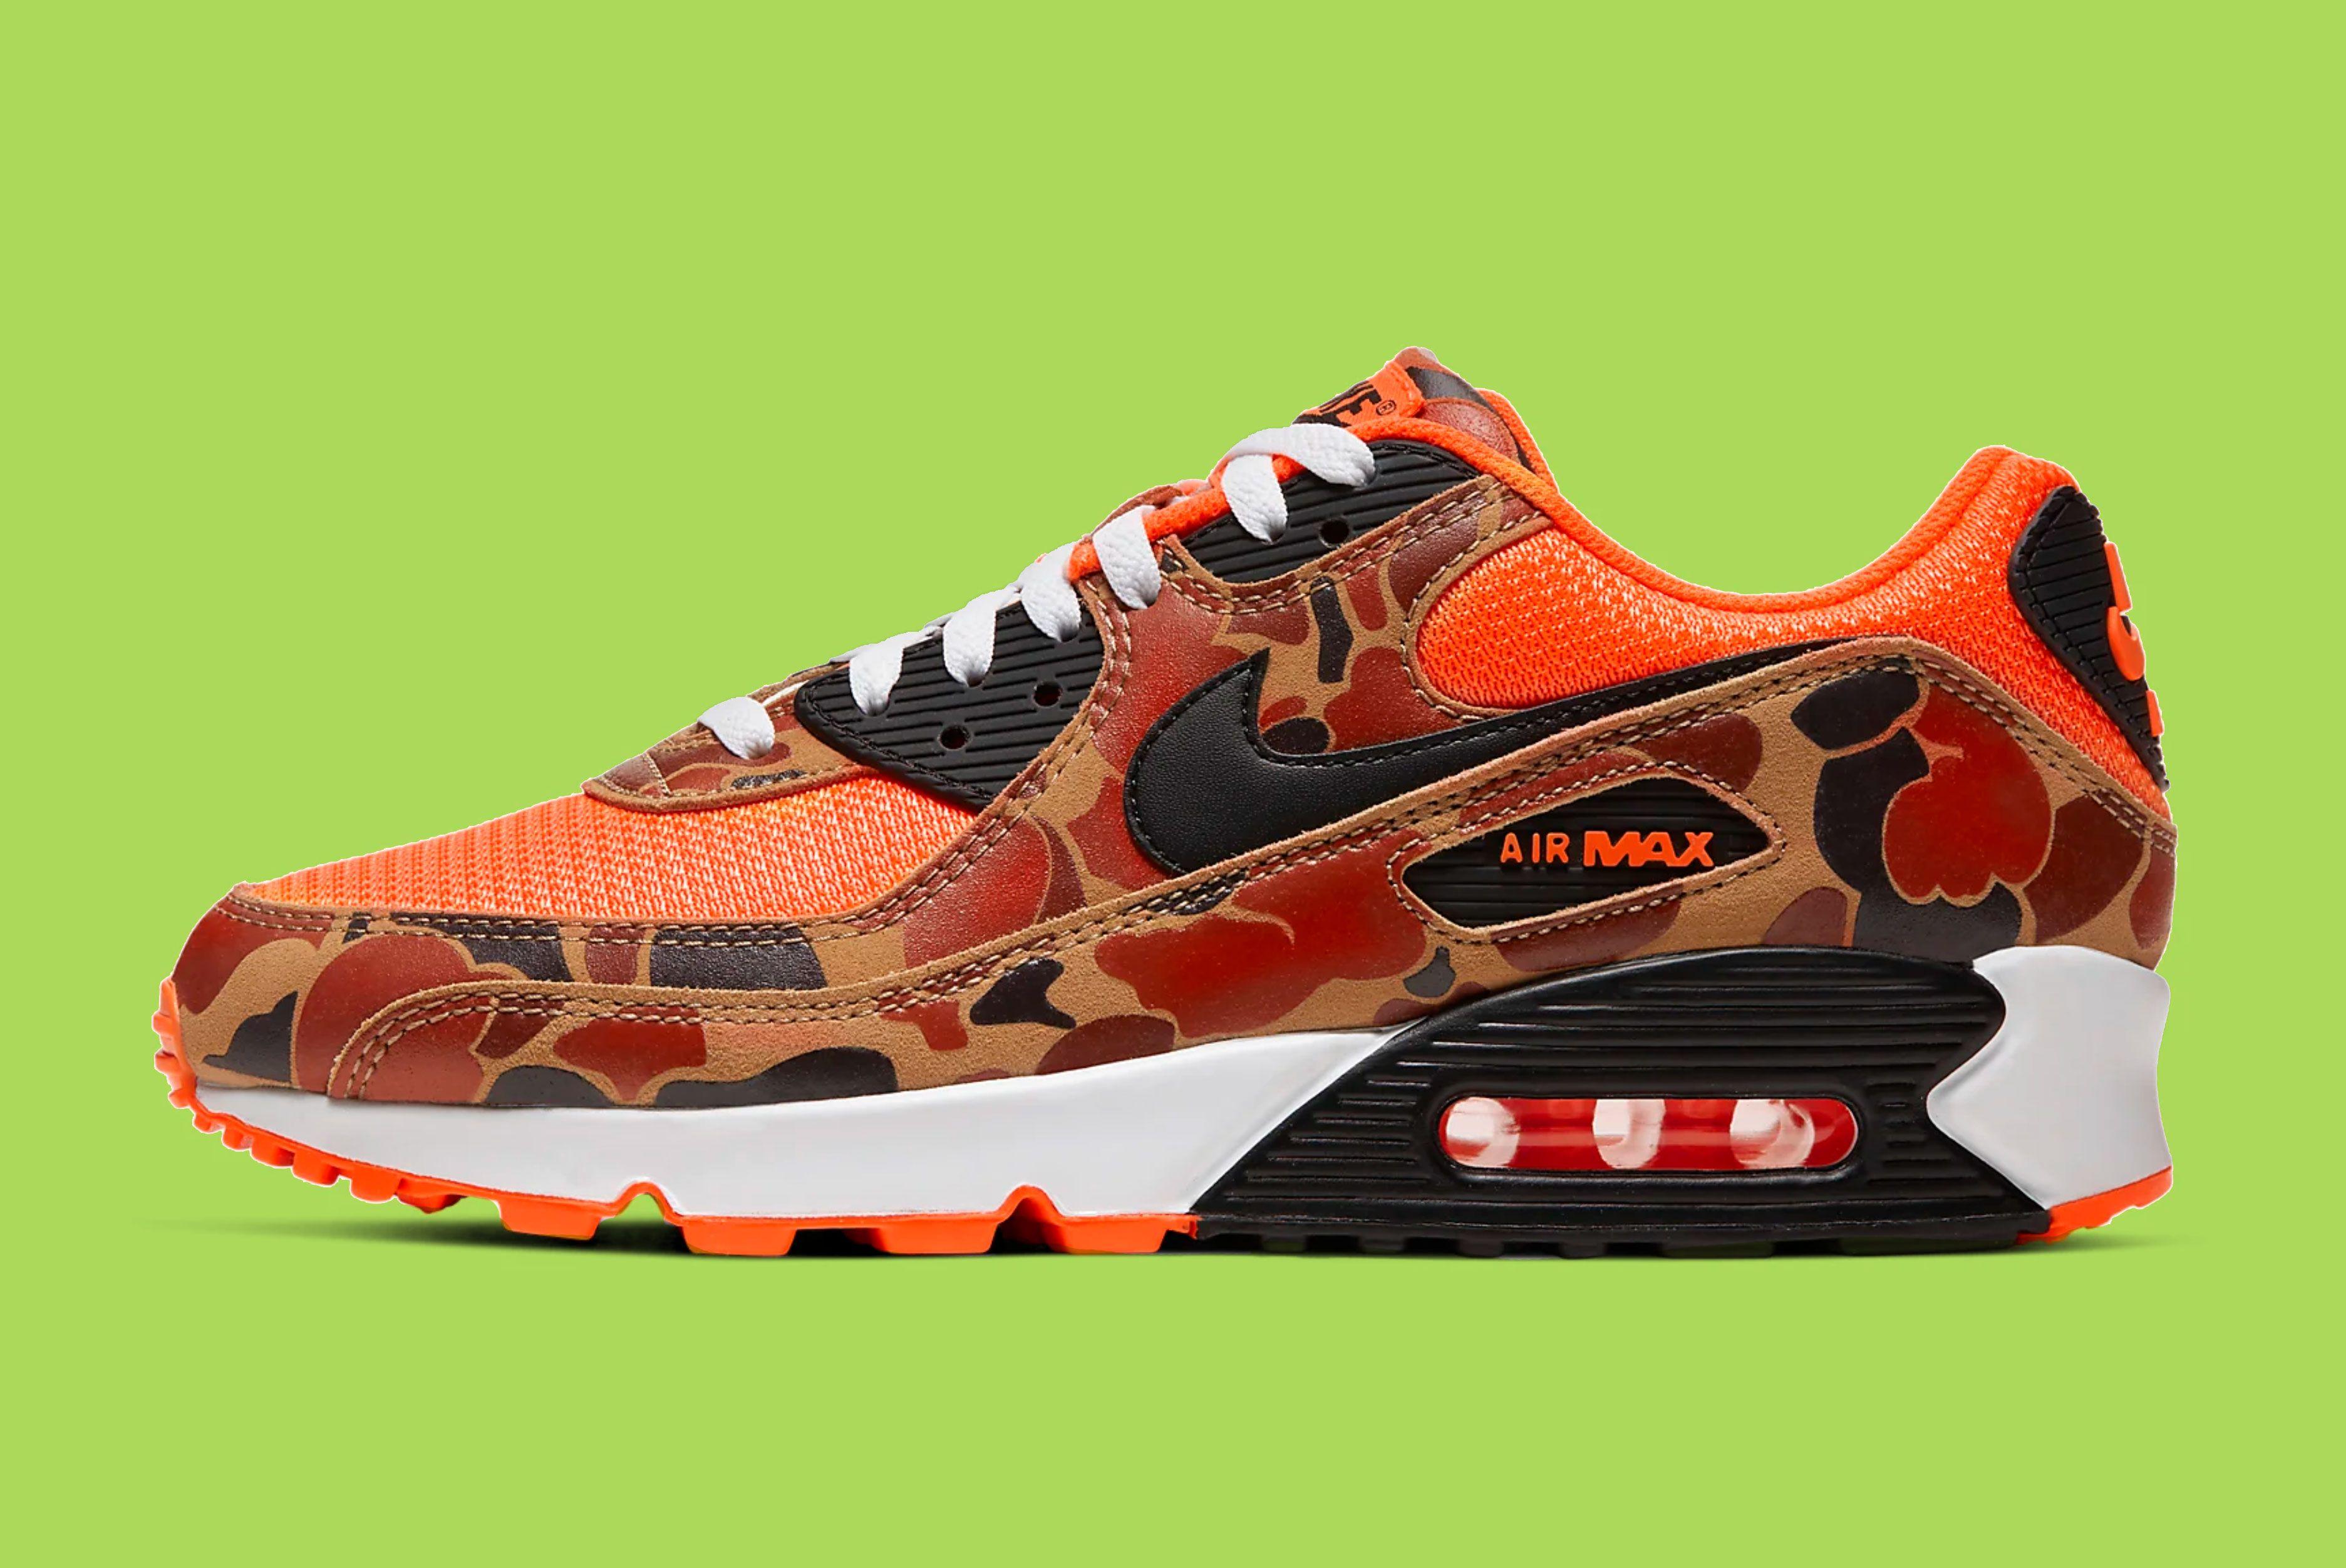 Nike Air Max 90 (Orange Camo)